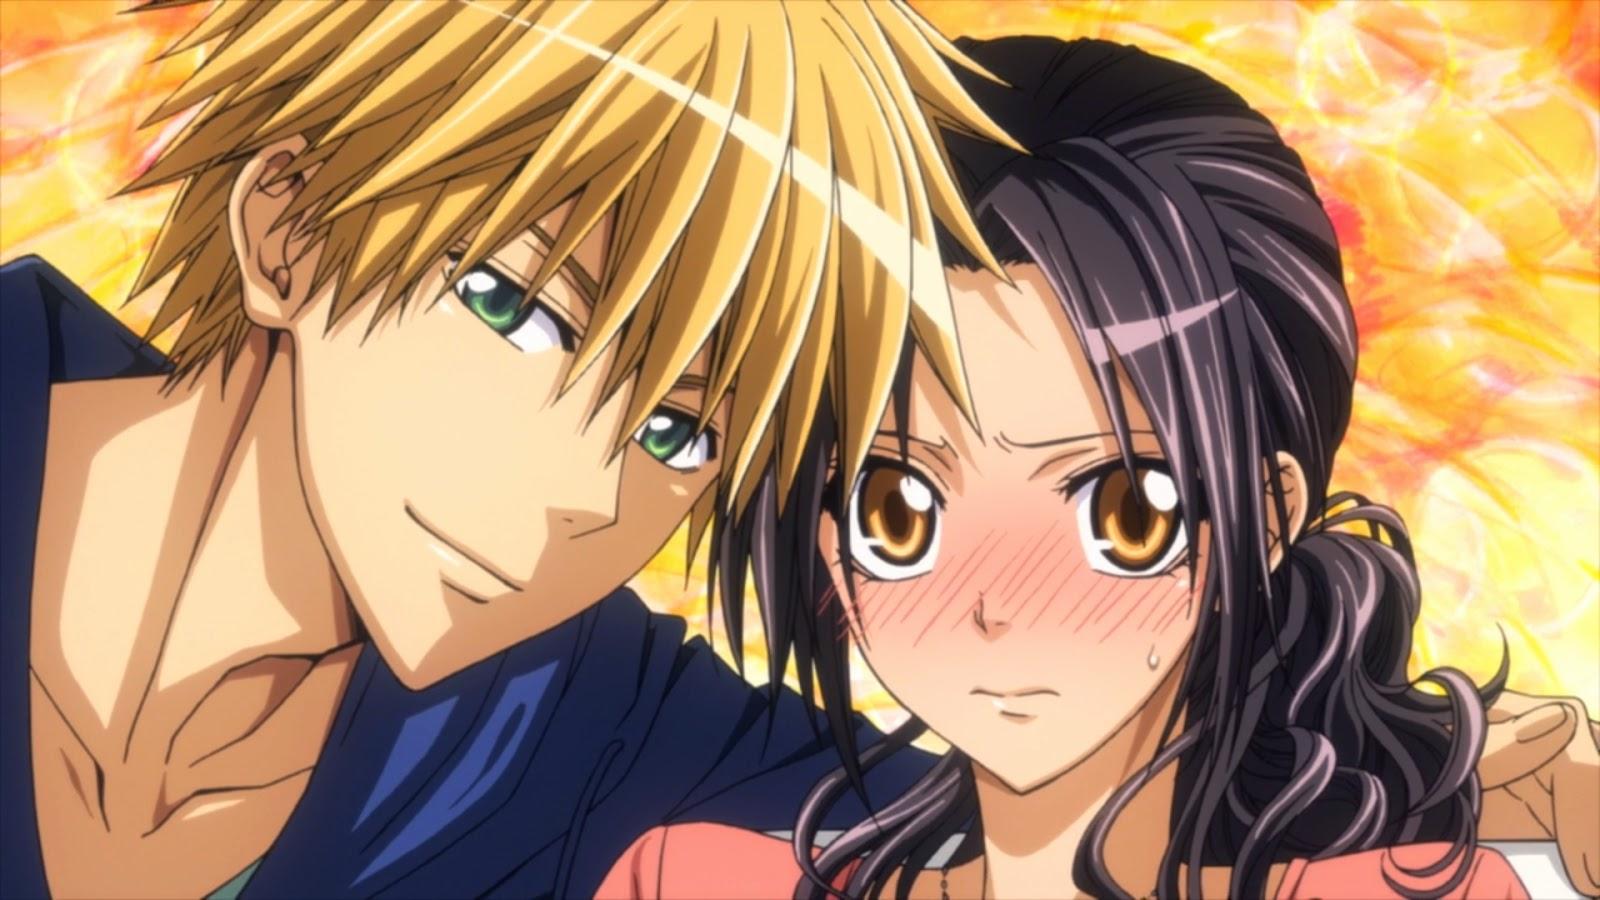 Anime de romance Kaichou wa Maid-sama